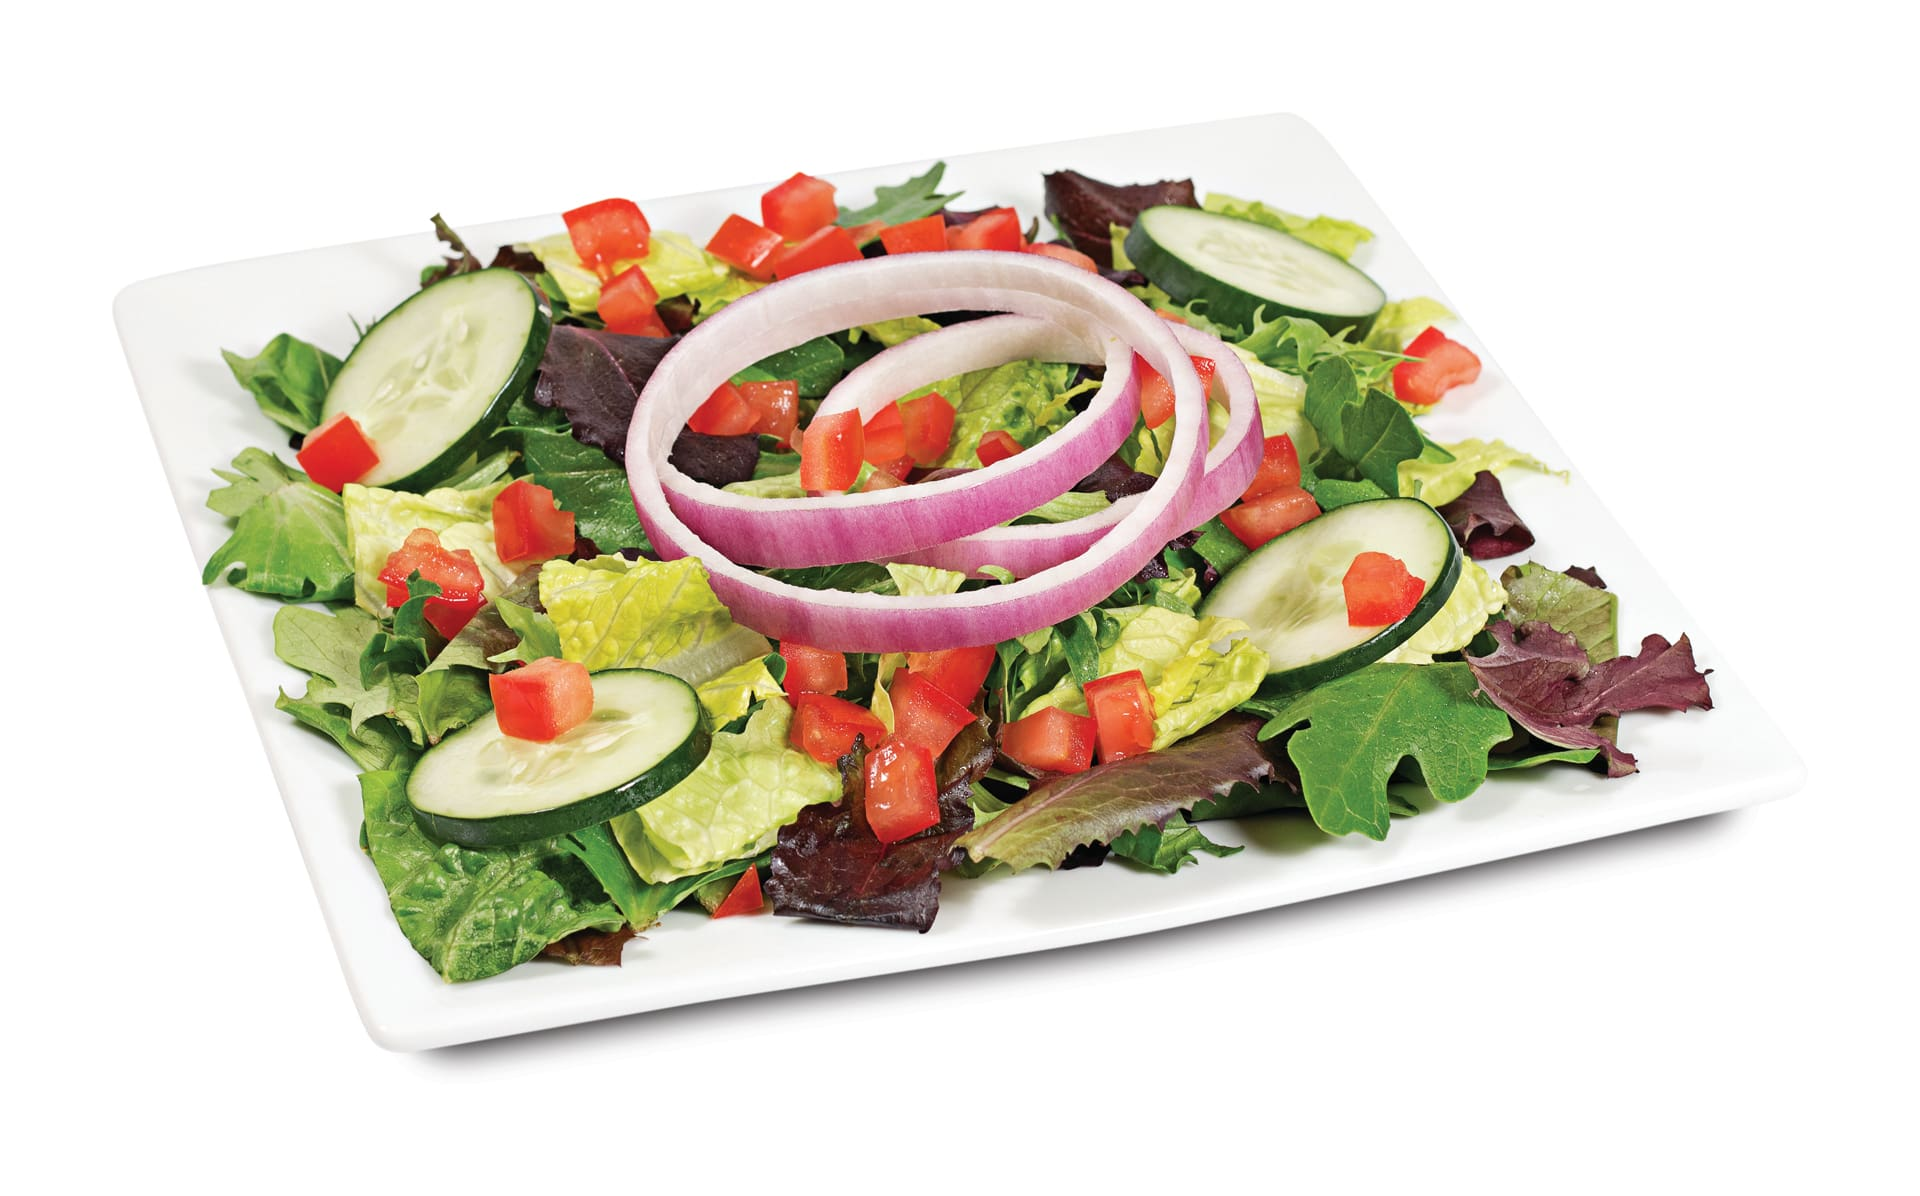 Sheetz House Salad